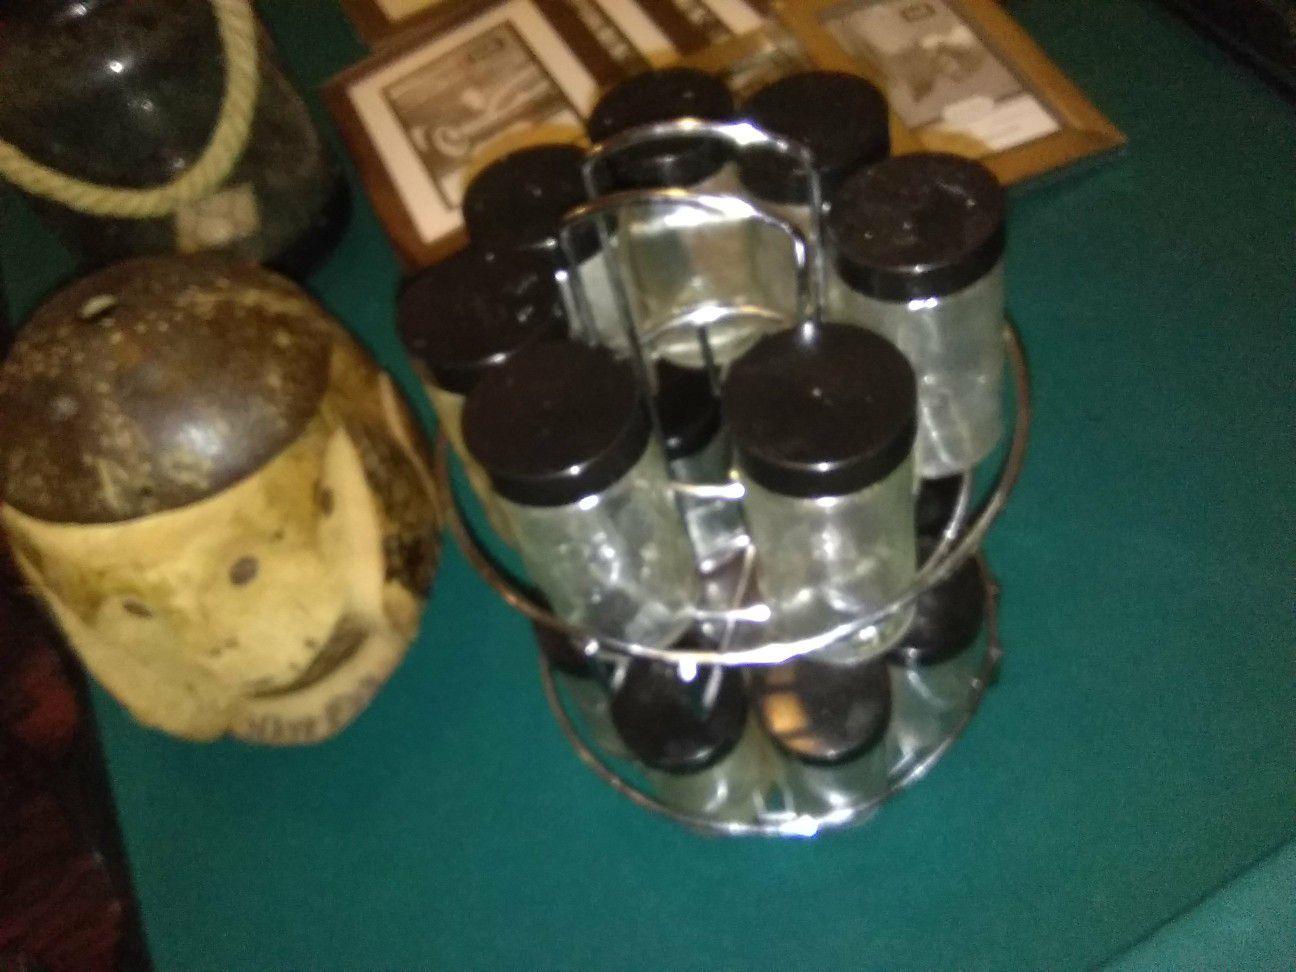 Spice rack with 15 empty jars